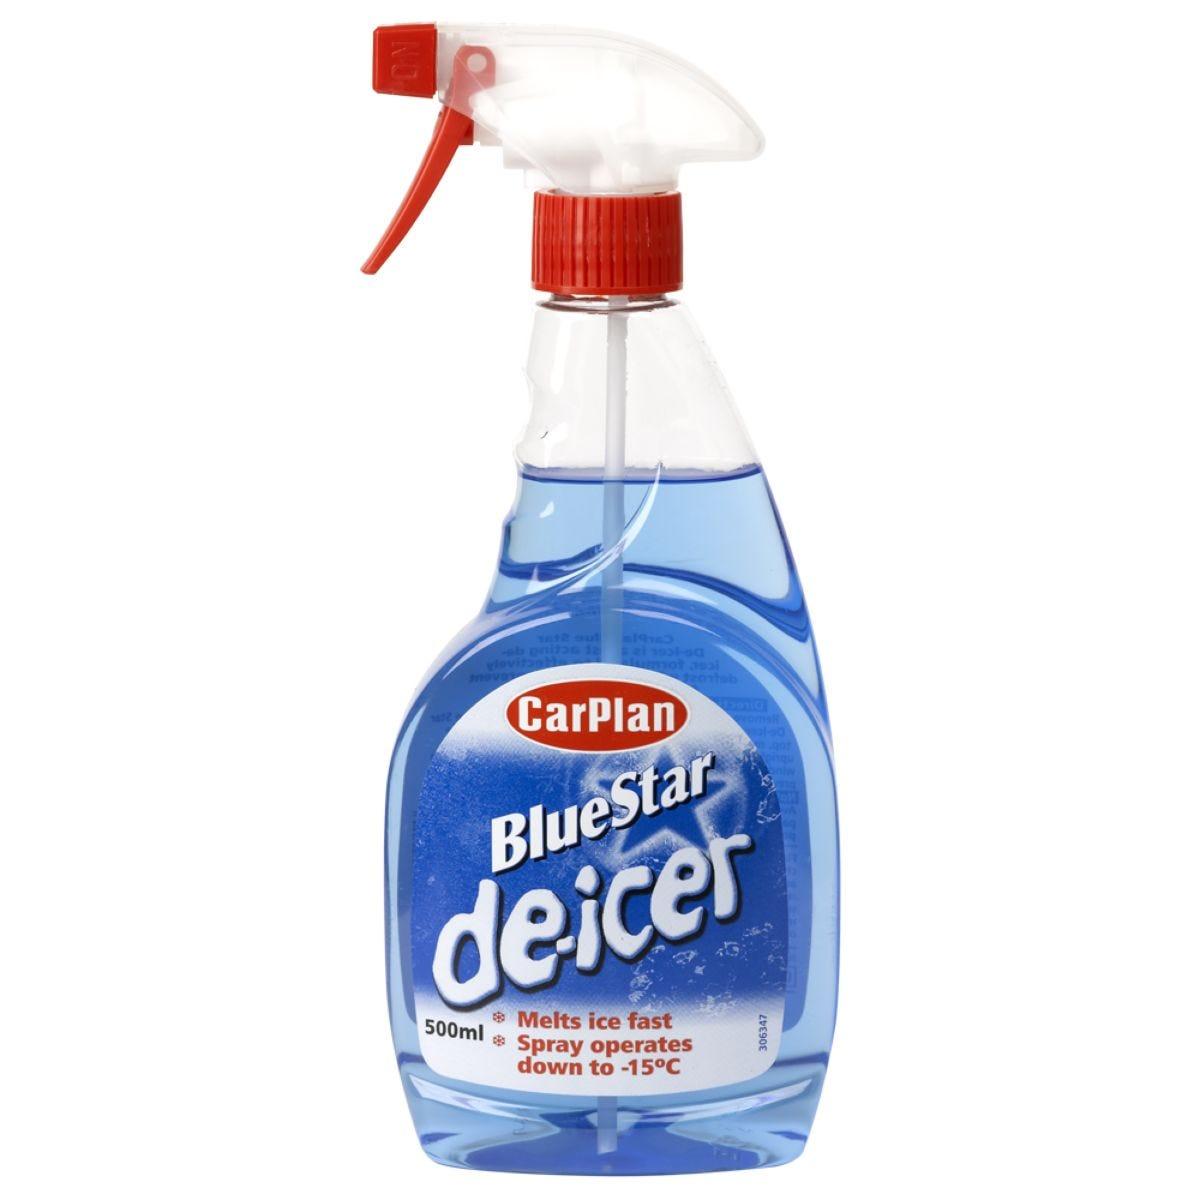 CarPlan De-Icer Spray - 500ml